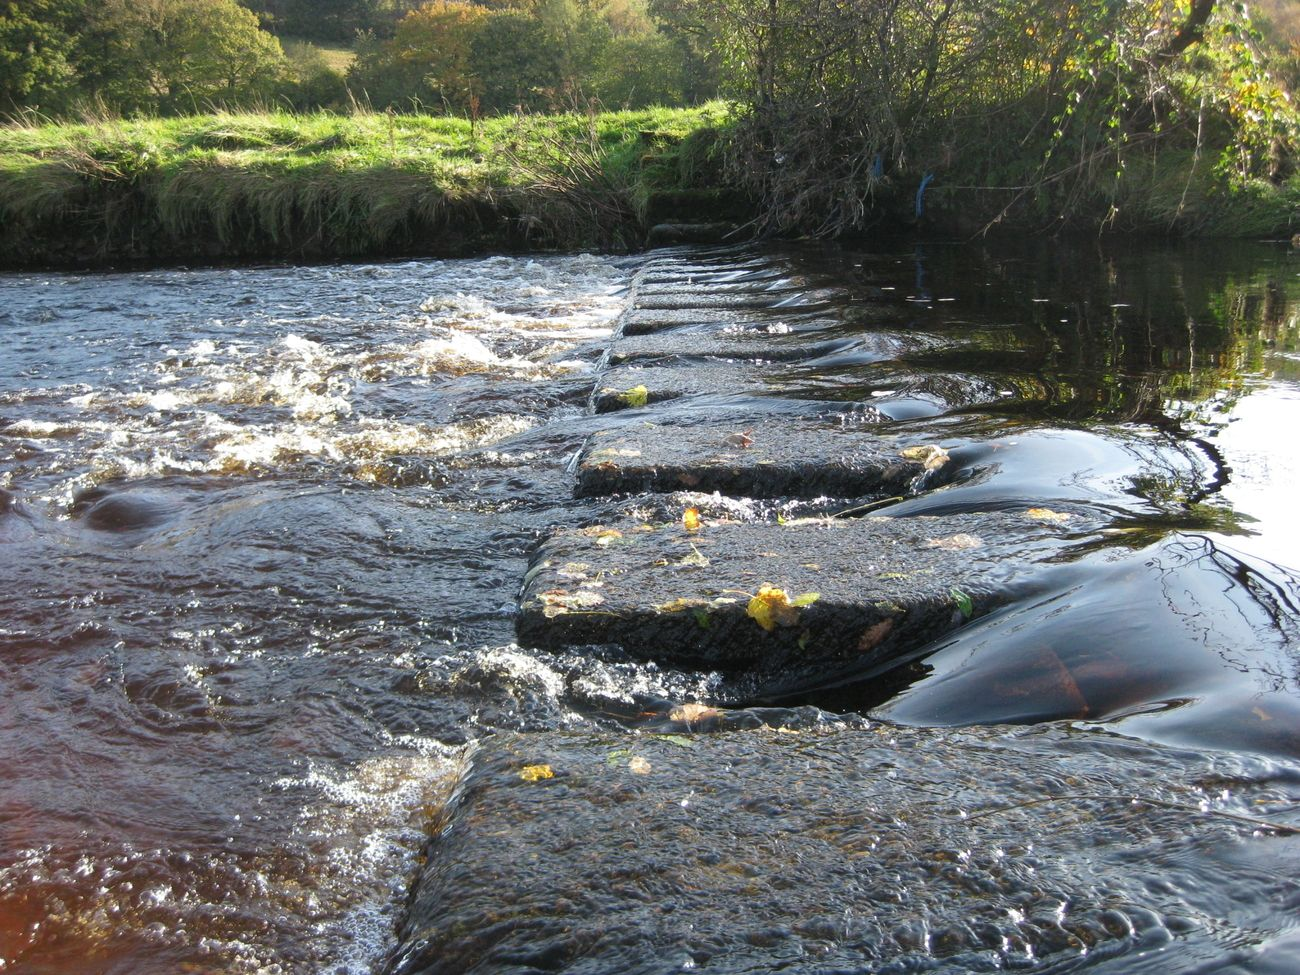 Taken in the village I grew up in in rural Wales, the Foel.